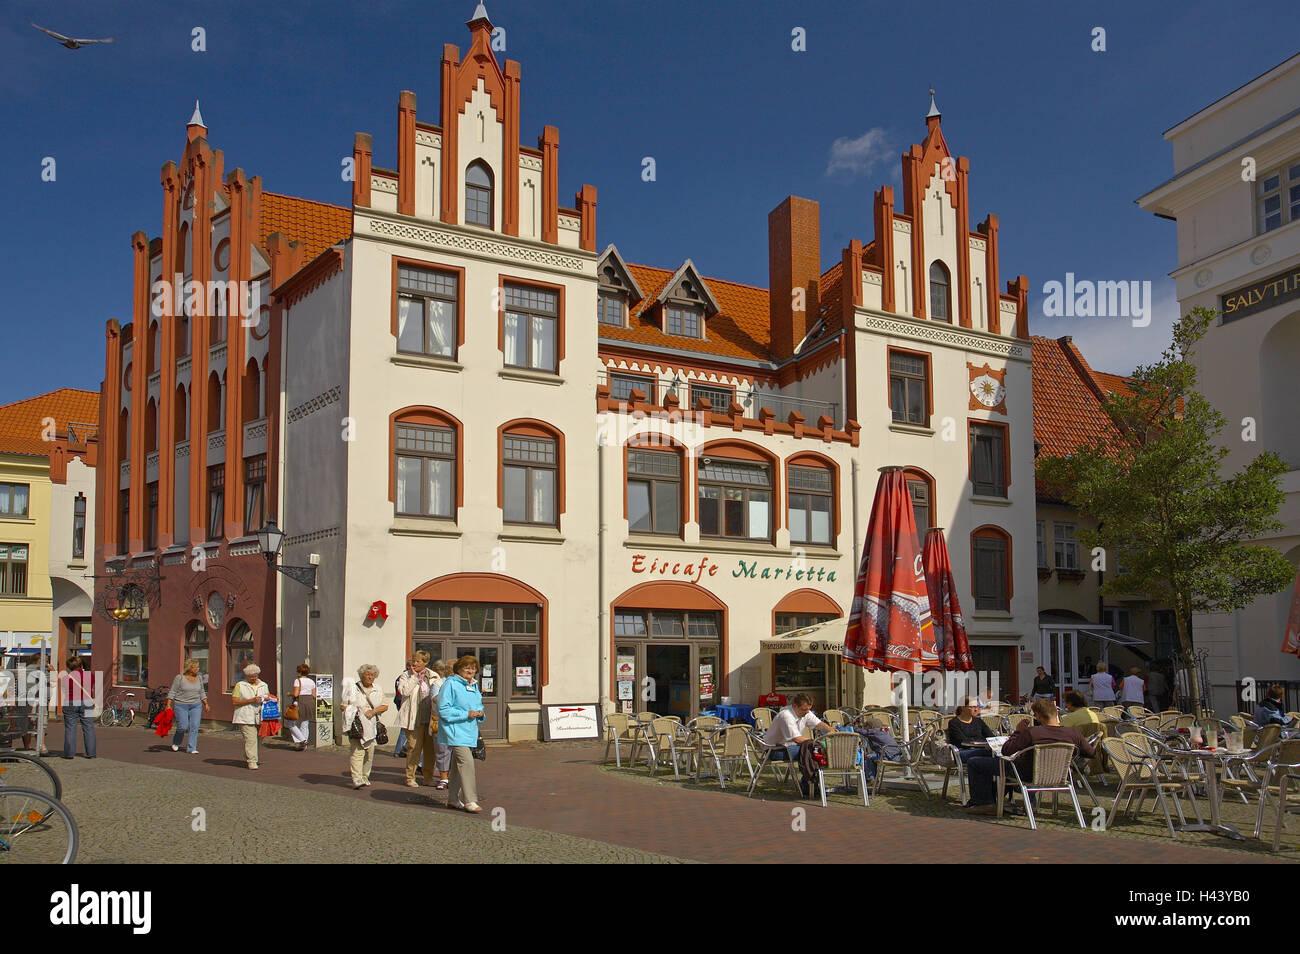 Germany, Mecklenburg-West Pomerania, Wismar, old mark, businessman's house, street cafe, - Stock Image